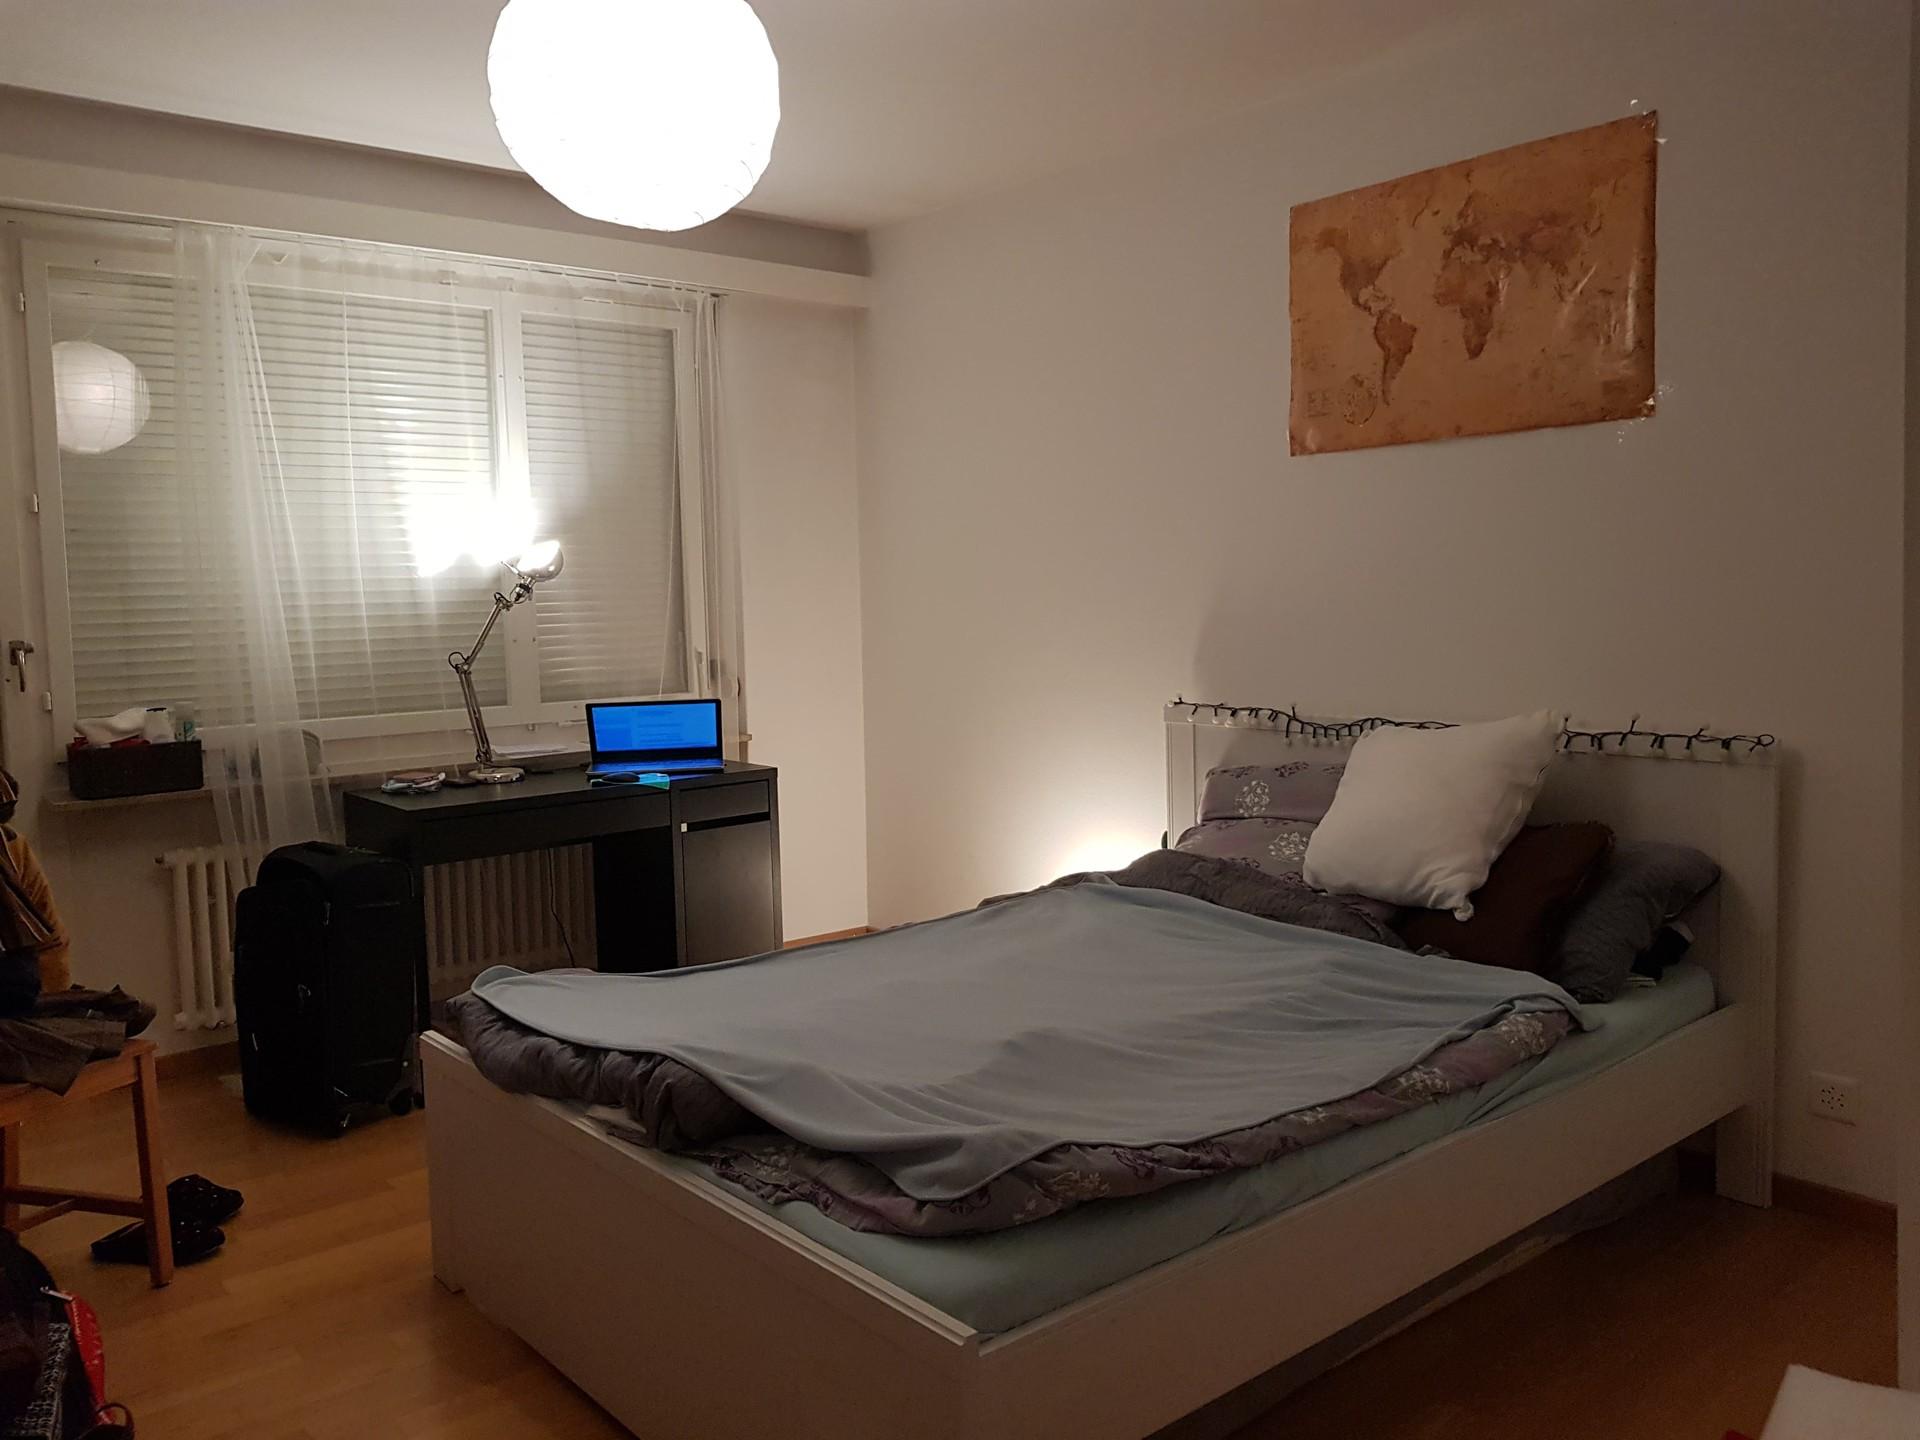 room-month-zurich-city-13ad20c0d56a8e13932b5ea301f6f69e